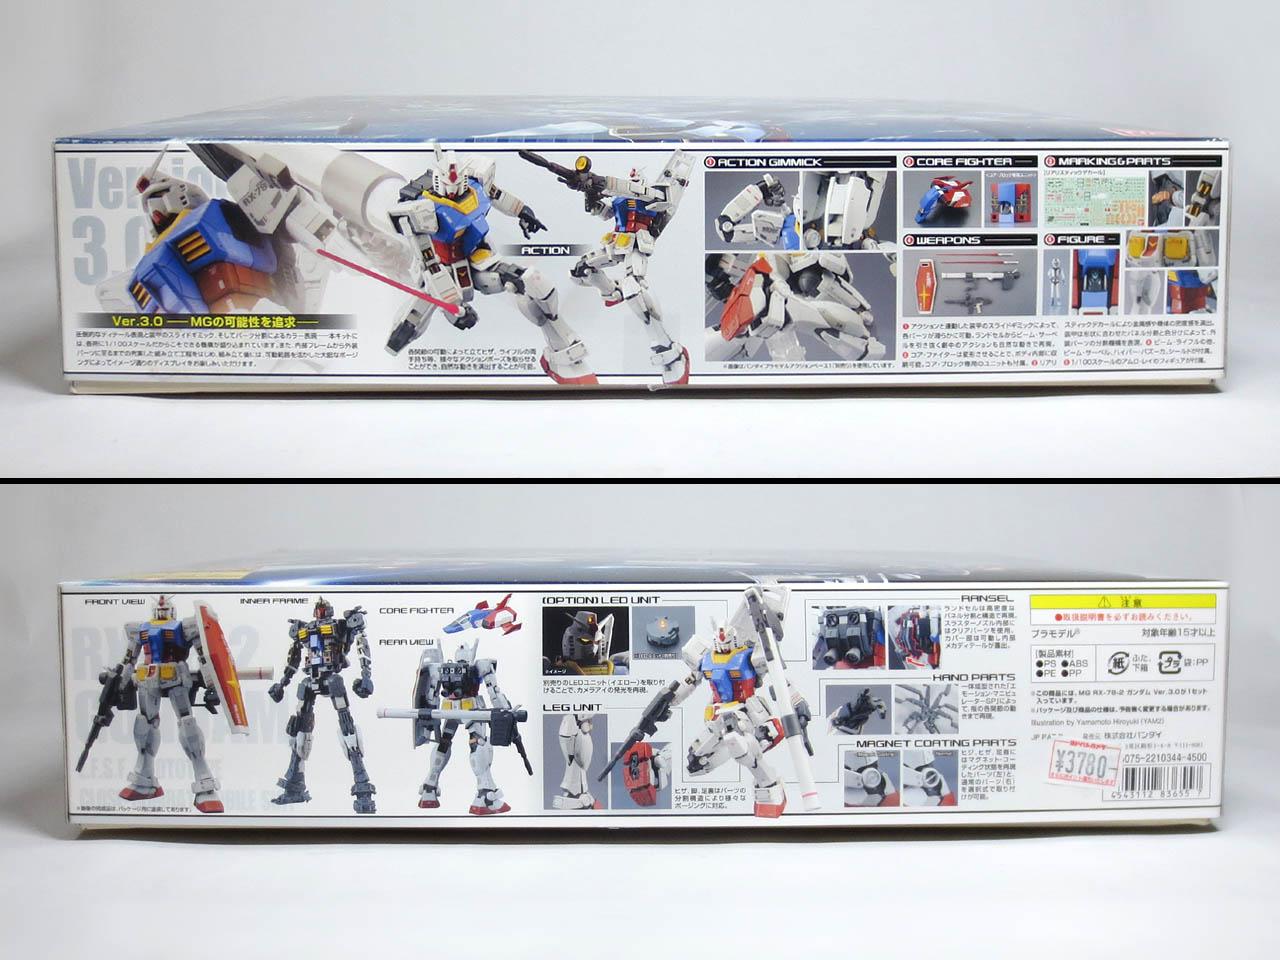 MG_RX78_2_Gundam_Ver3_A02.jpg